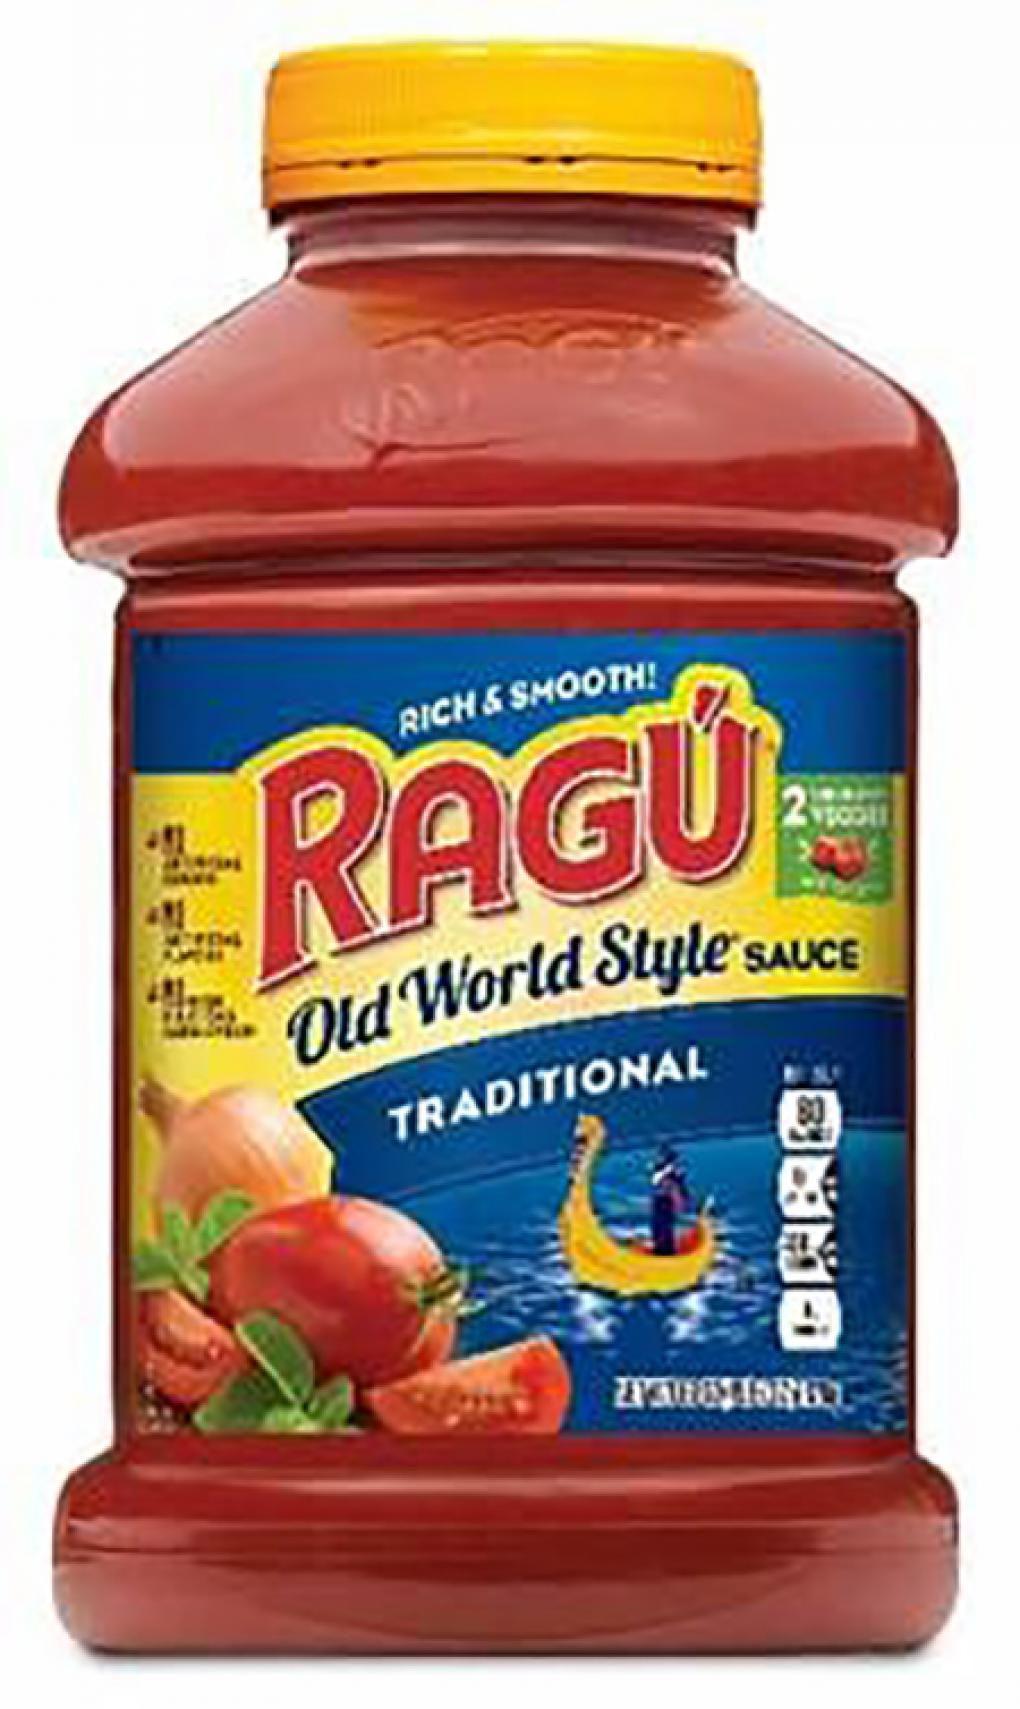 Recall Ragu